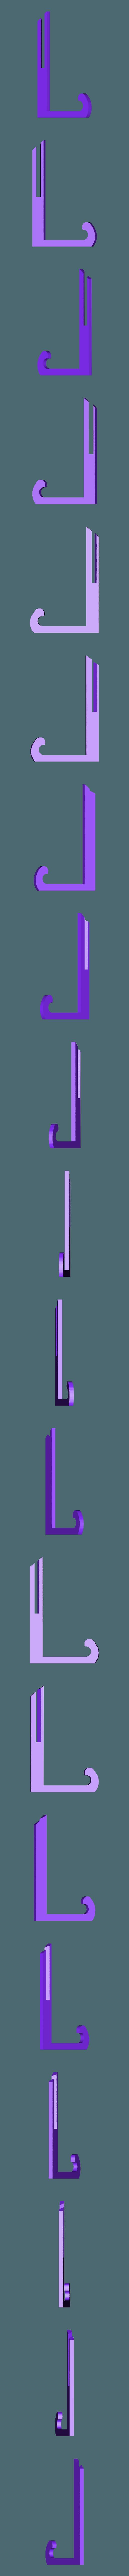 Left.stl Download free STL file Picture Frame Stand / Holder • 3D print template, crisonescu